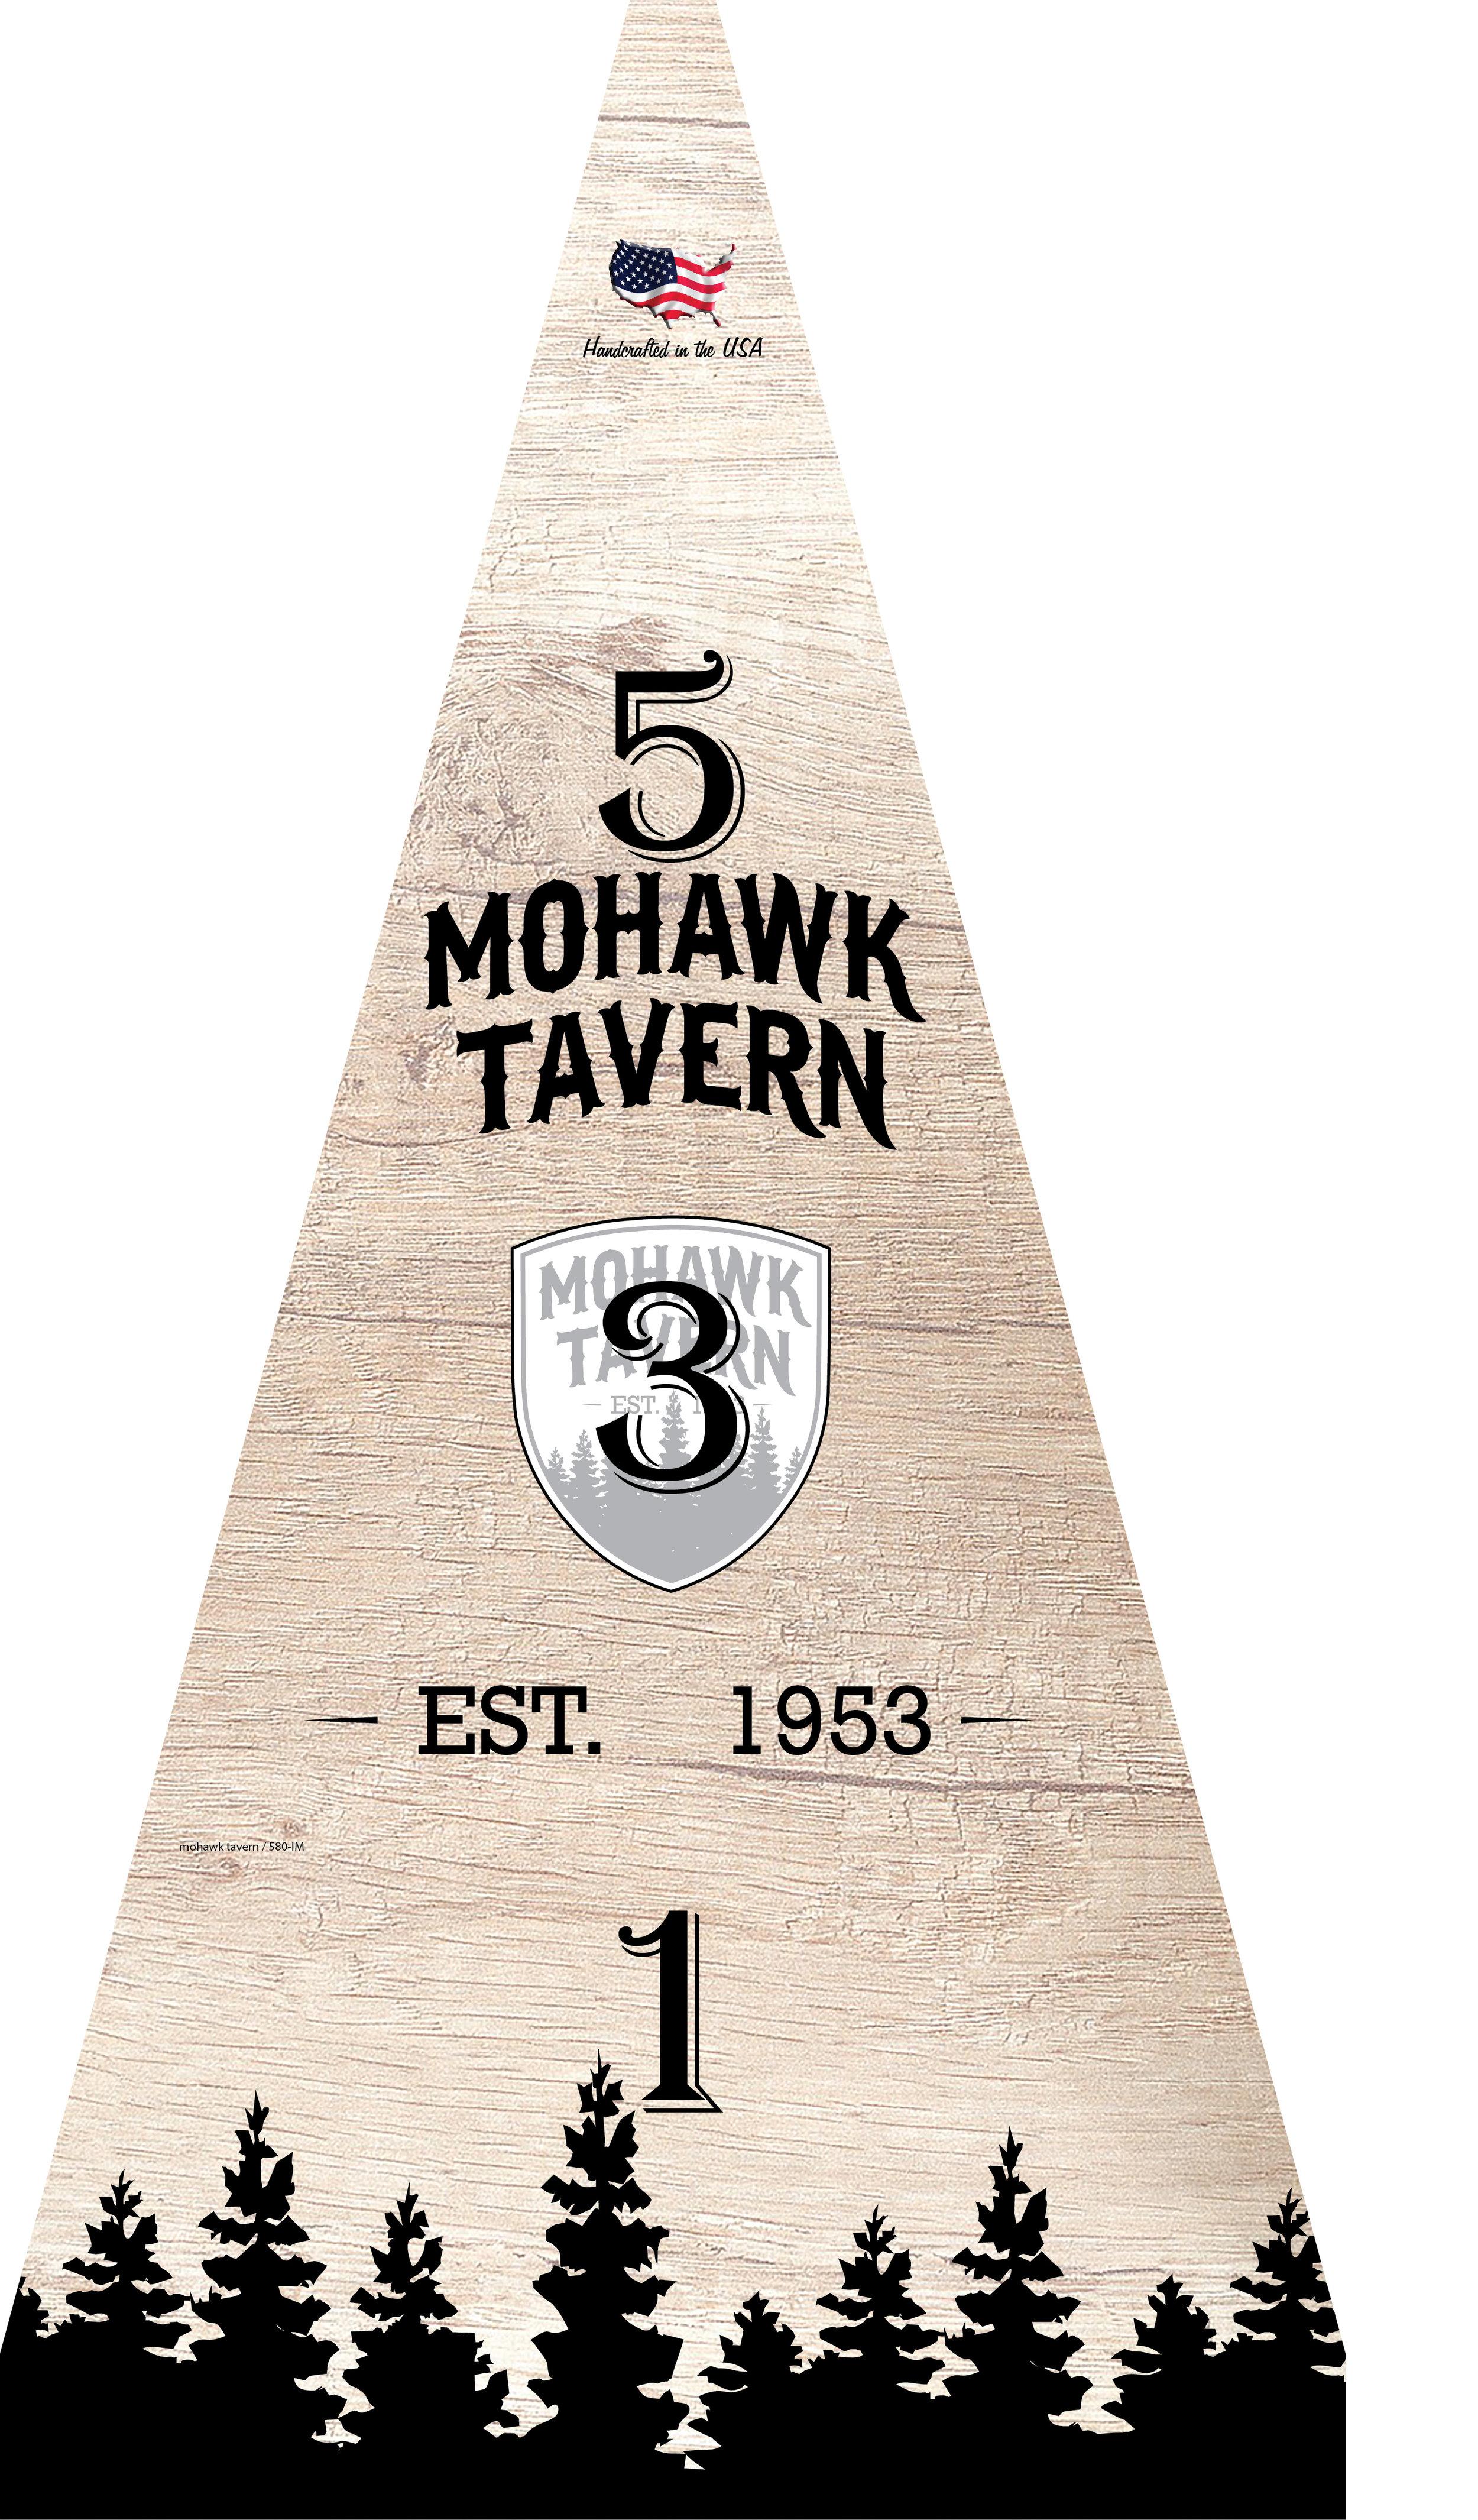 mohawk tavern.jpg